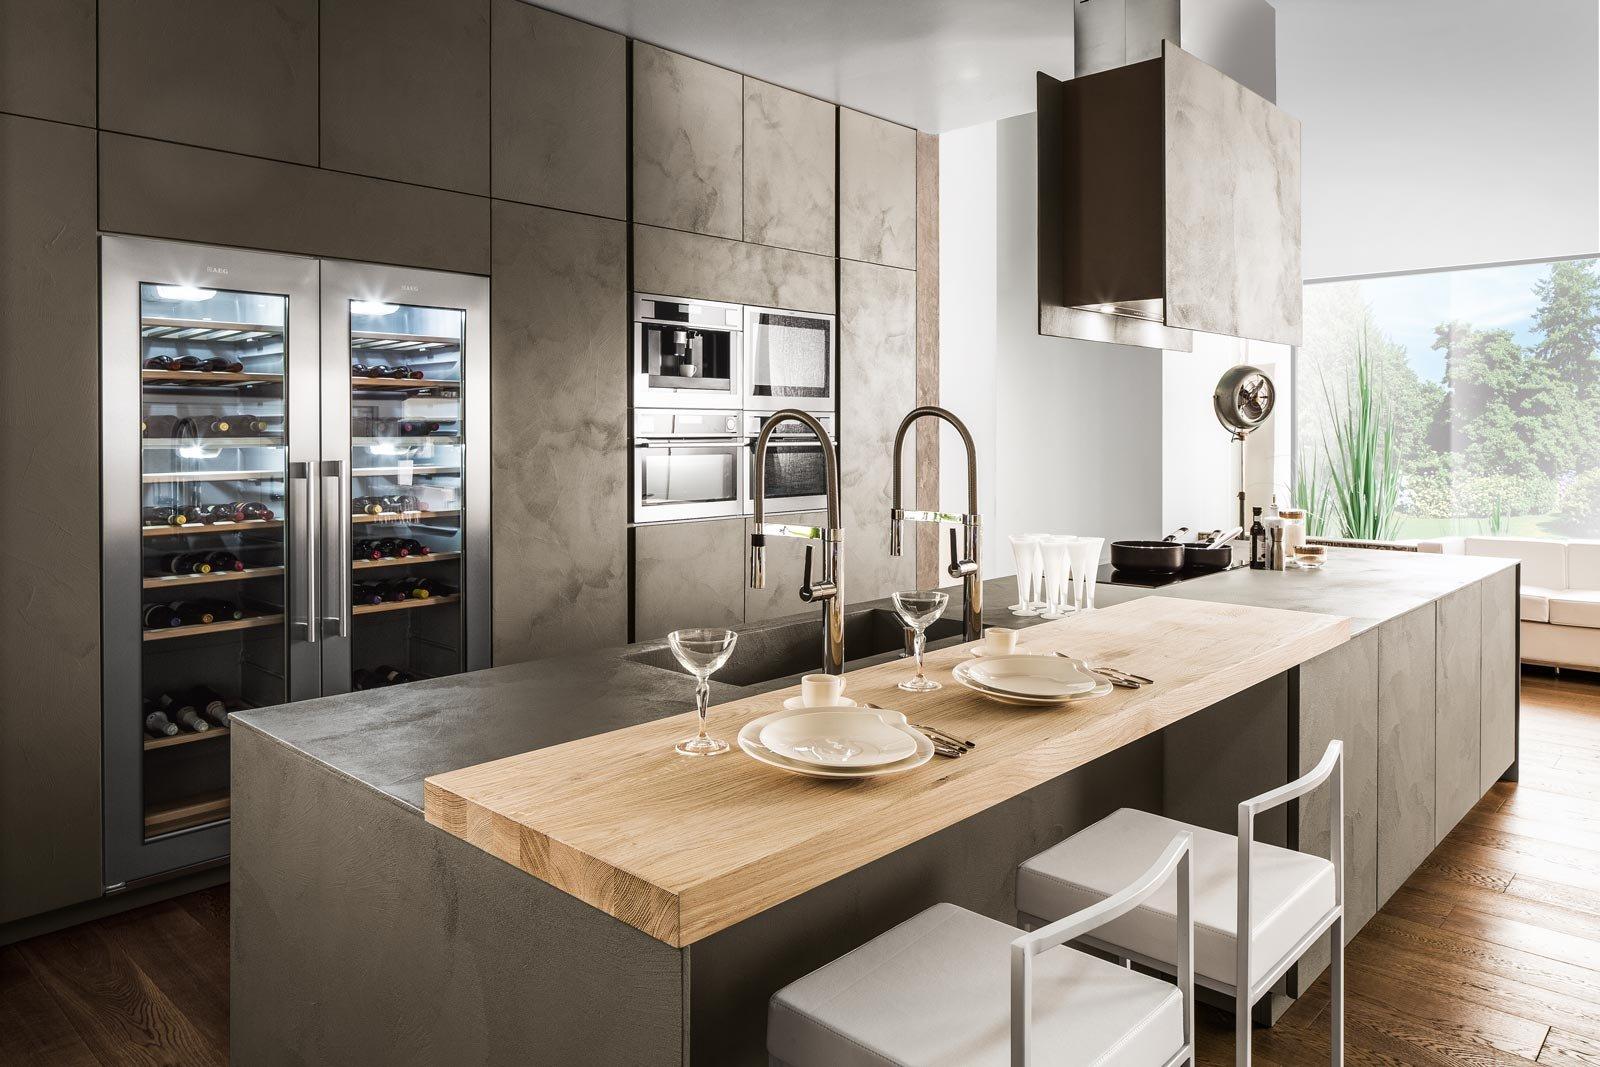 Eurocucina 2016 superfici soft touch per le nuove cucine cose di casa - Arrex cucine moderne ...